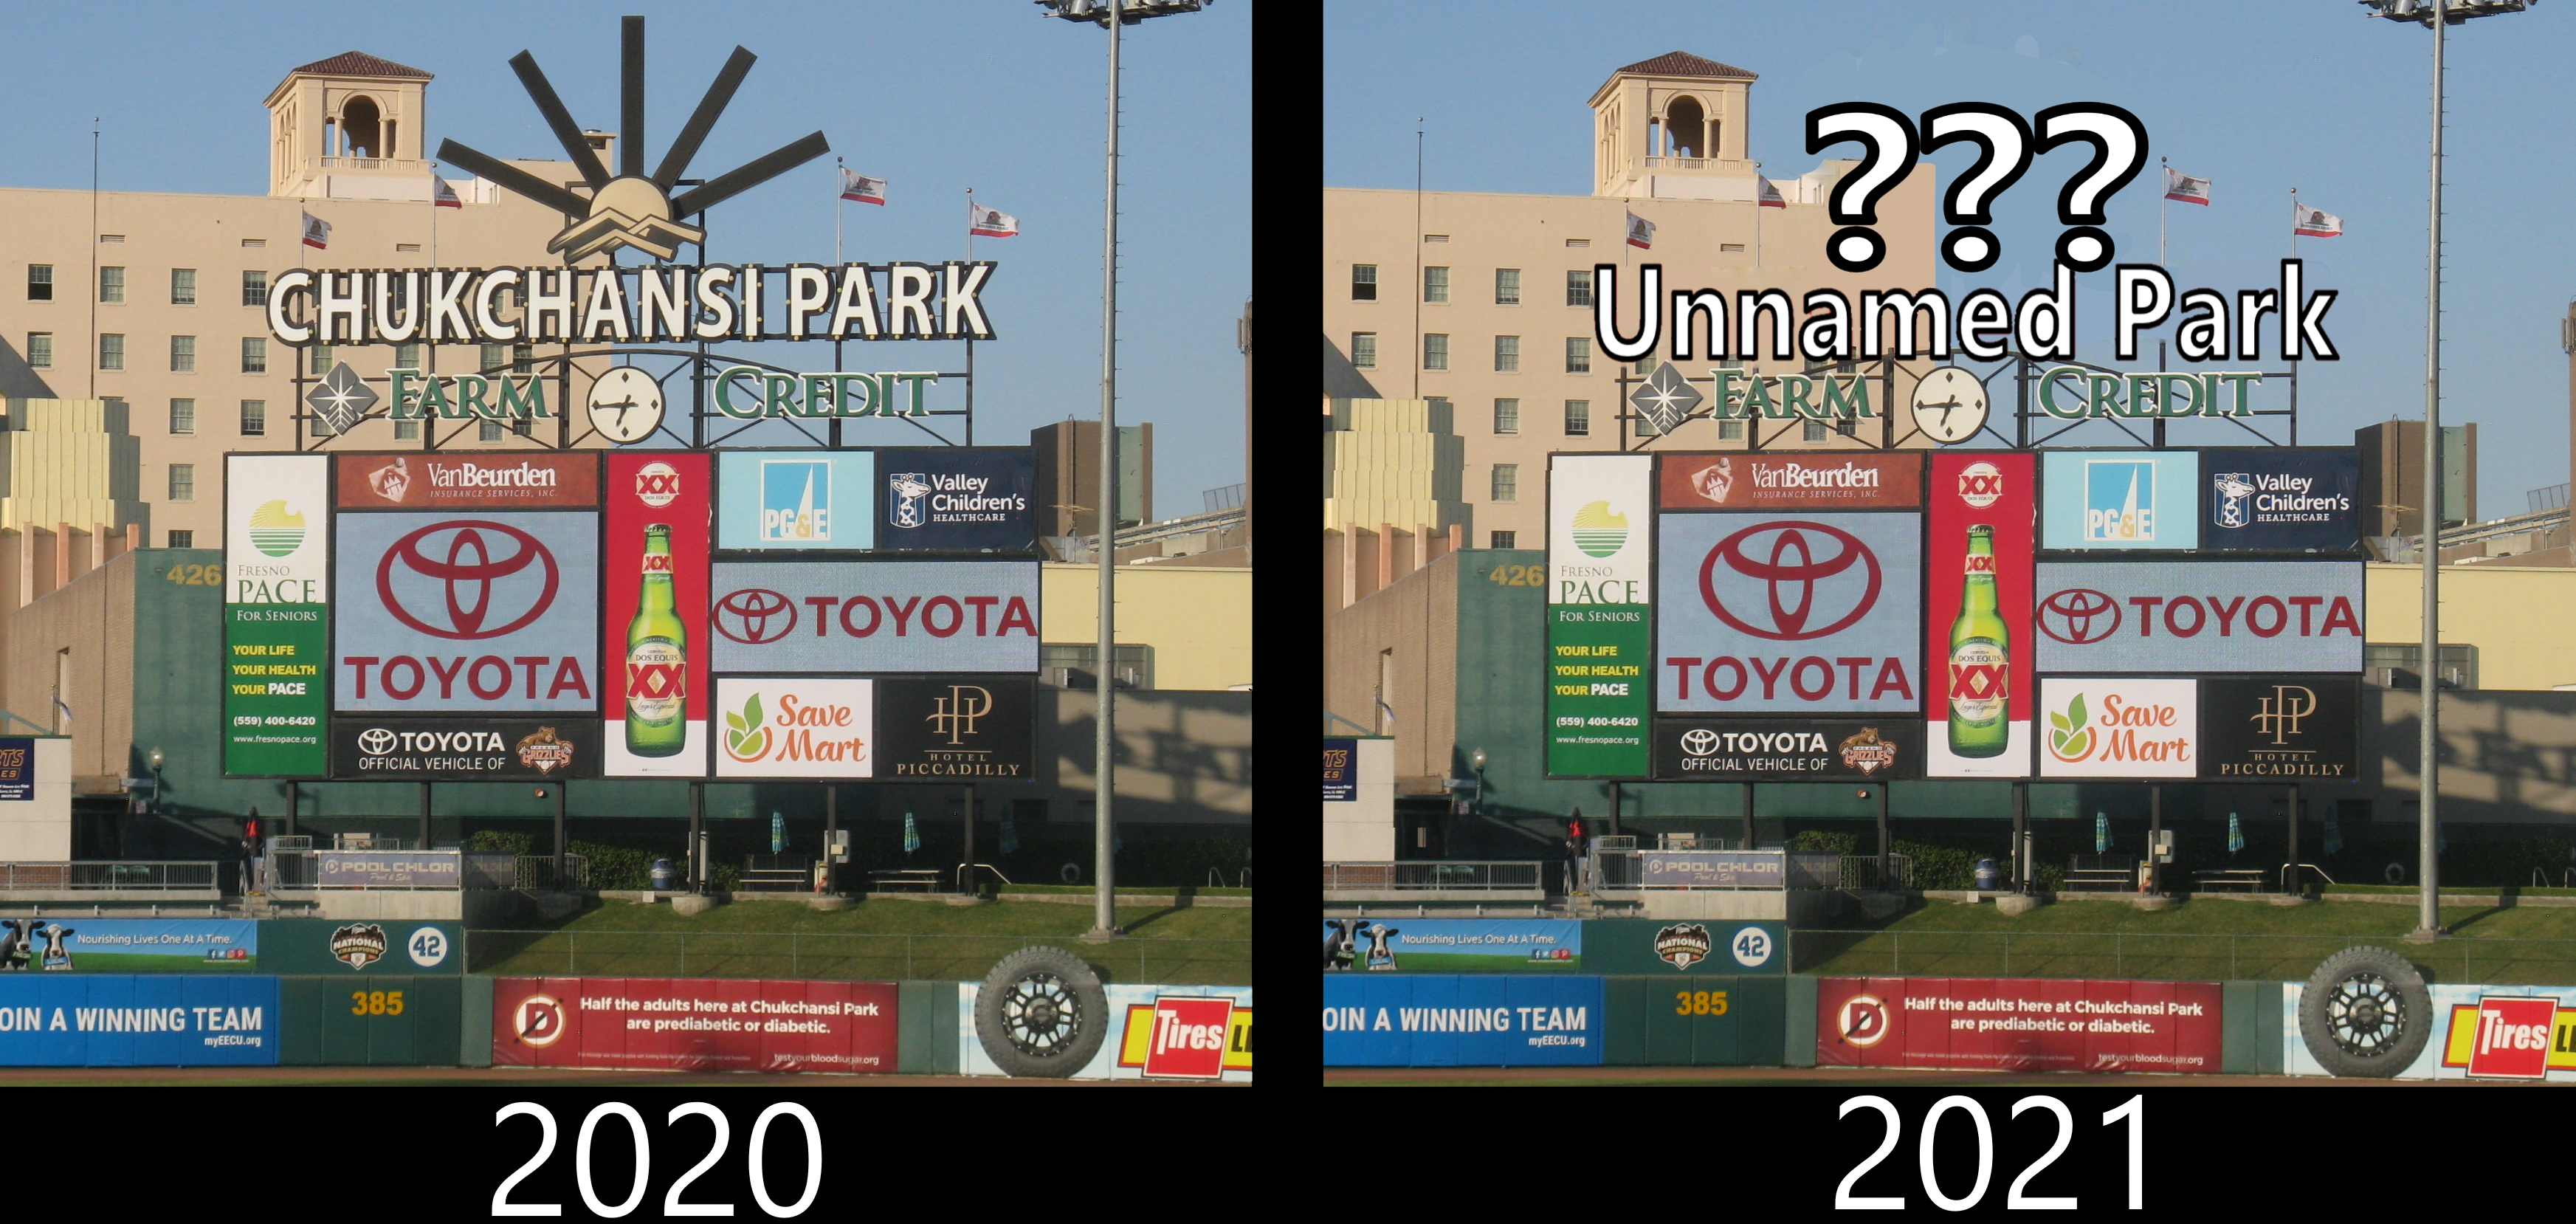 Chukchansi Park in downtown Fresno won't renew naming rights